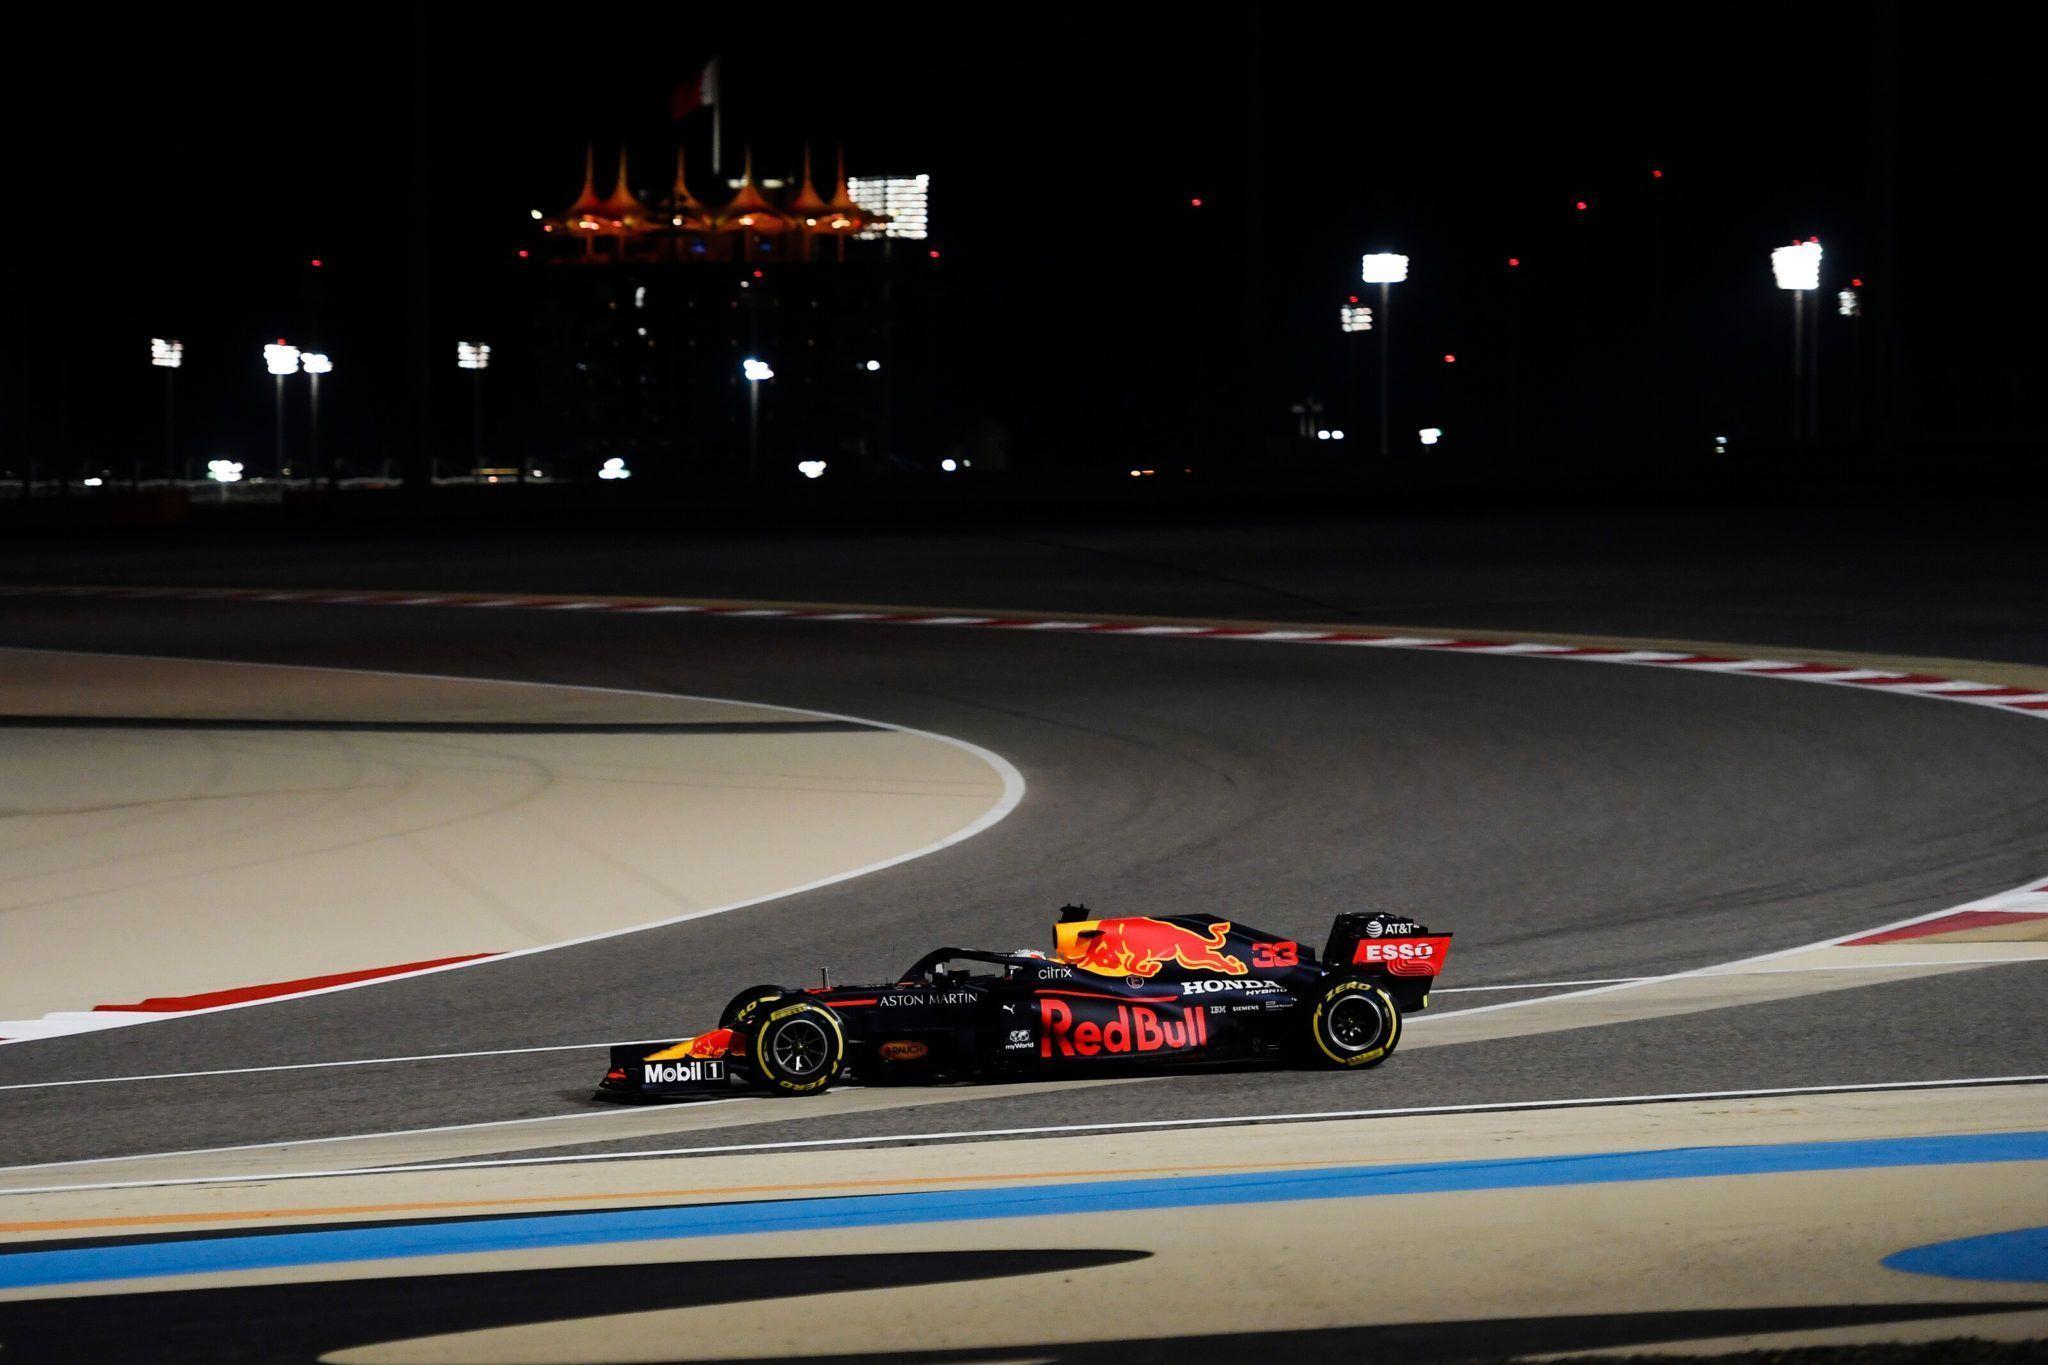 Max Verstappen, F1, Sakhir GP